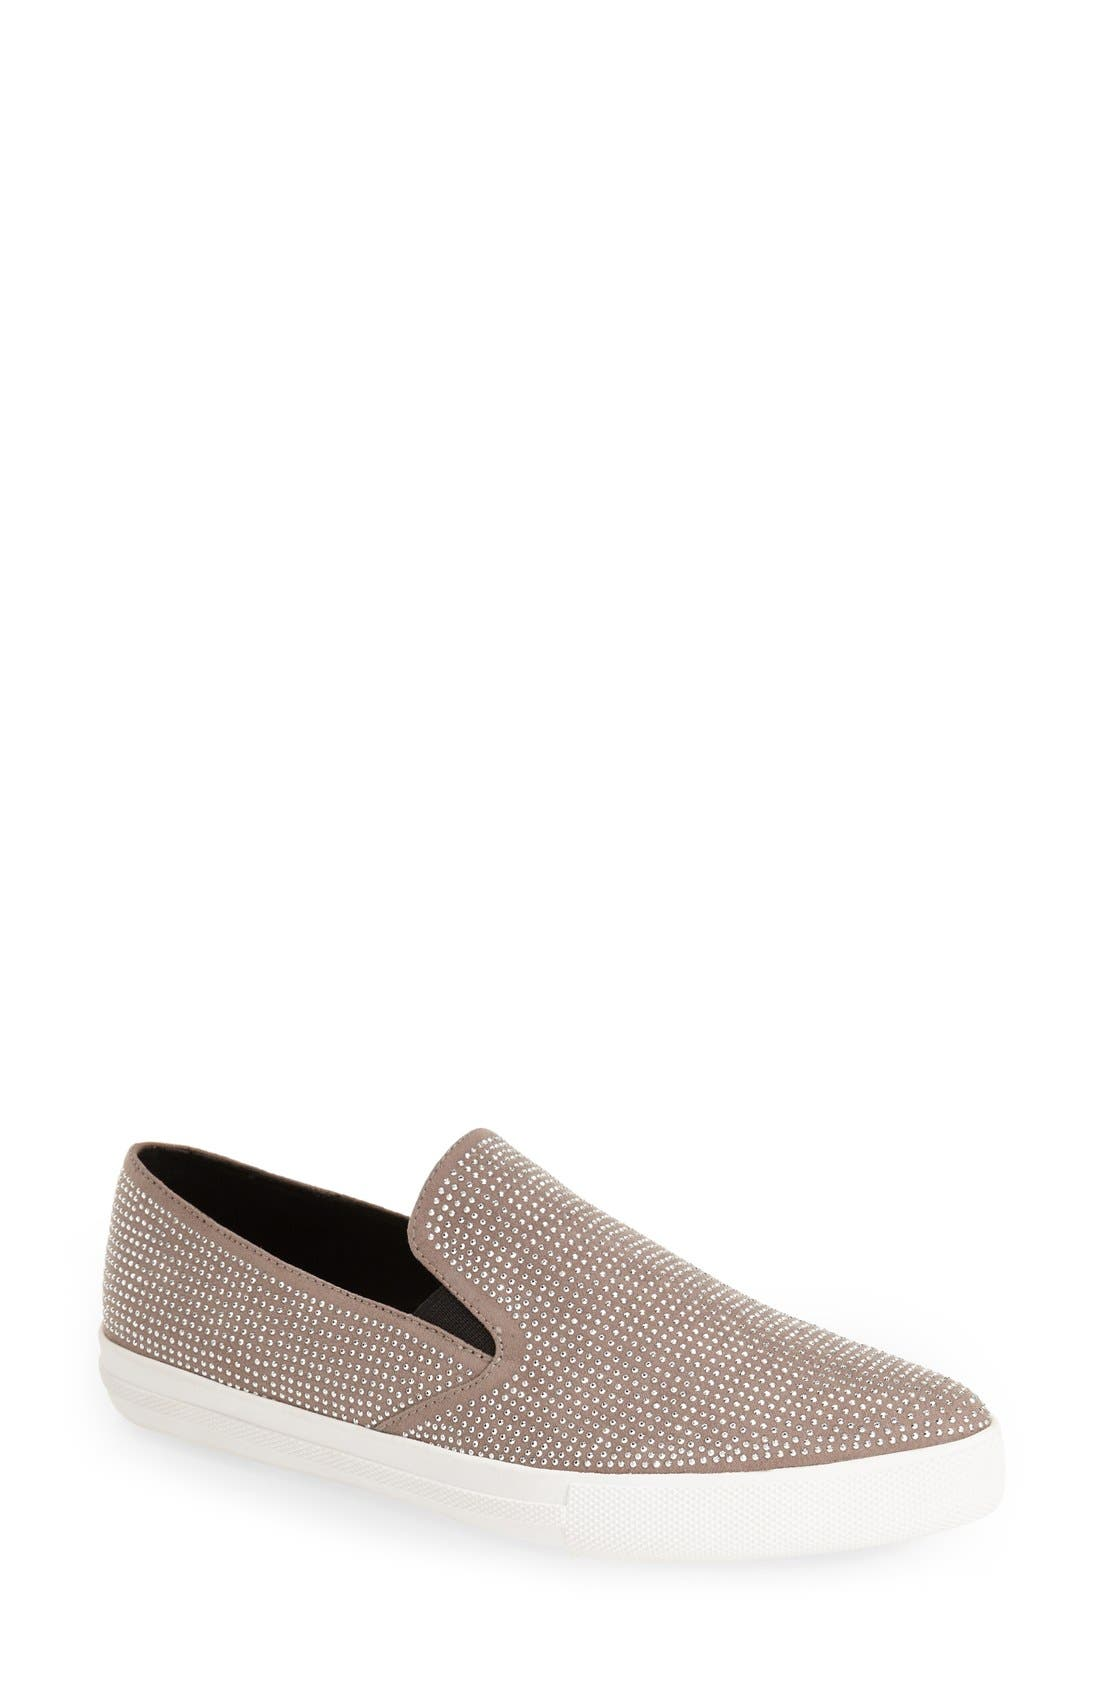 Main Image - Kristin Cavallari 'Outcome' Embellished Slip-On Sneaker (Women)